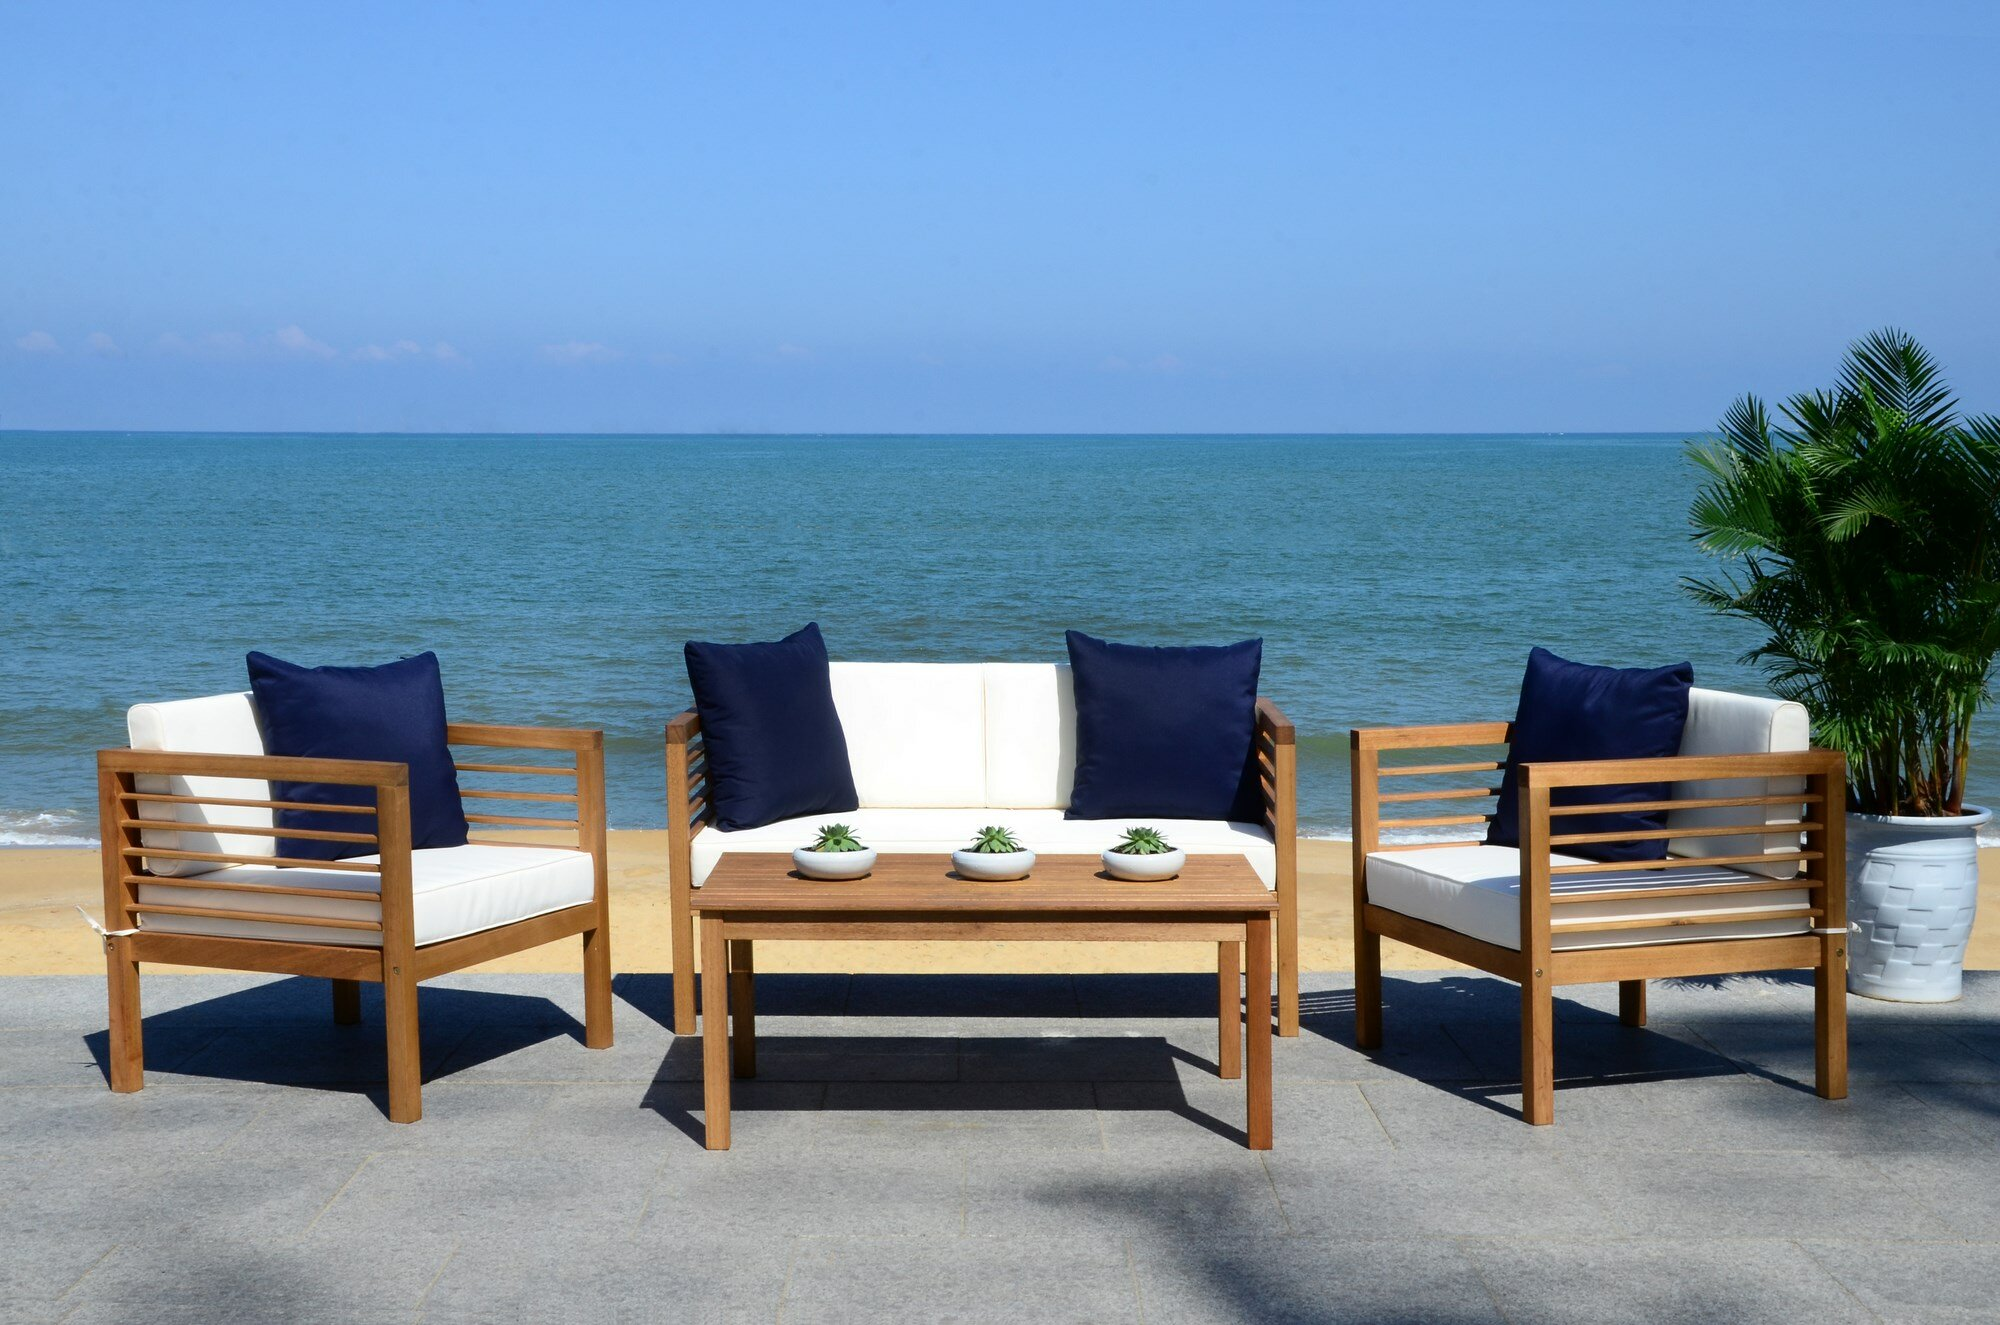 Beachcrest Home Daytona 4 Piece Sofa Set with Cushions & Reviews